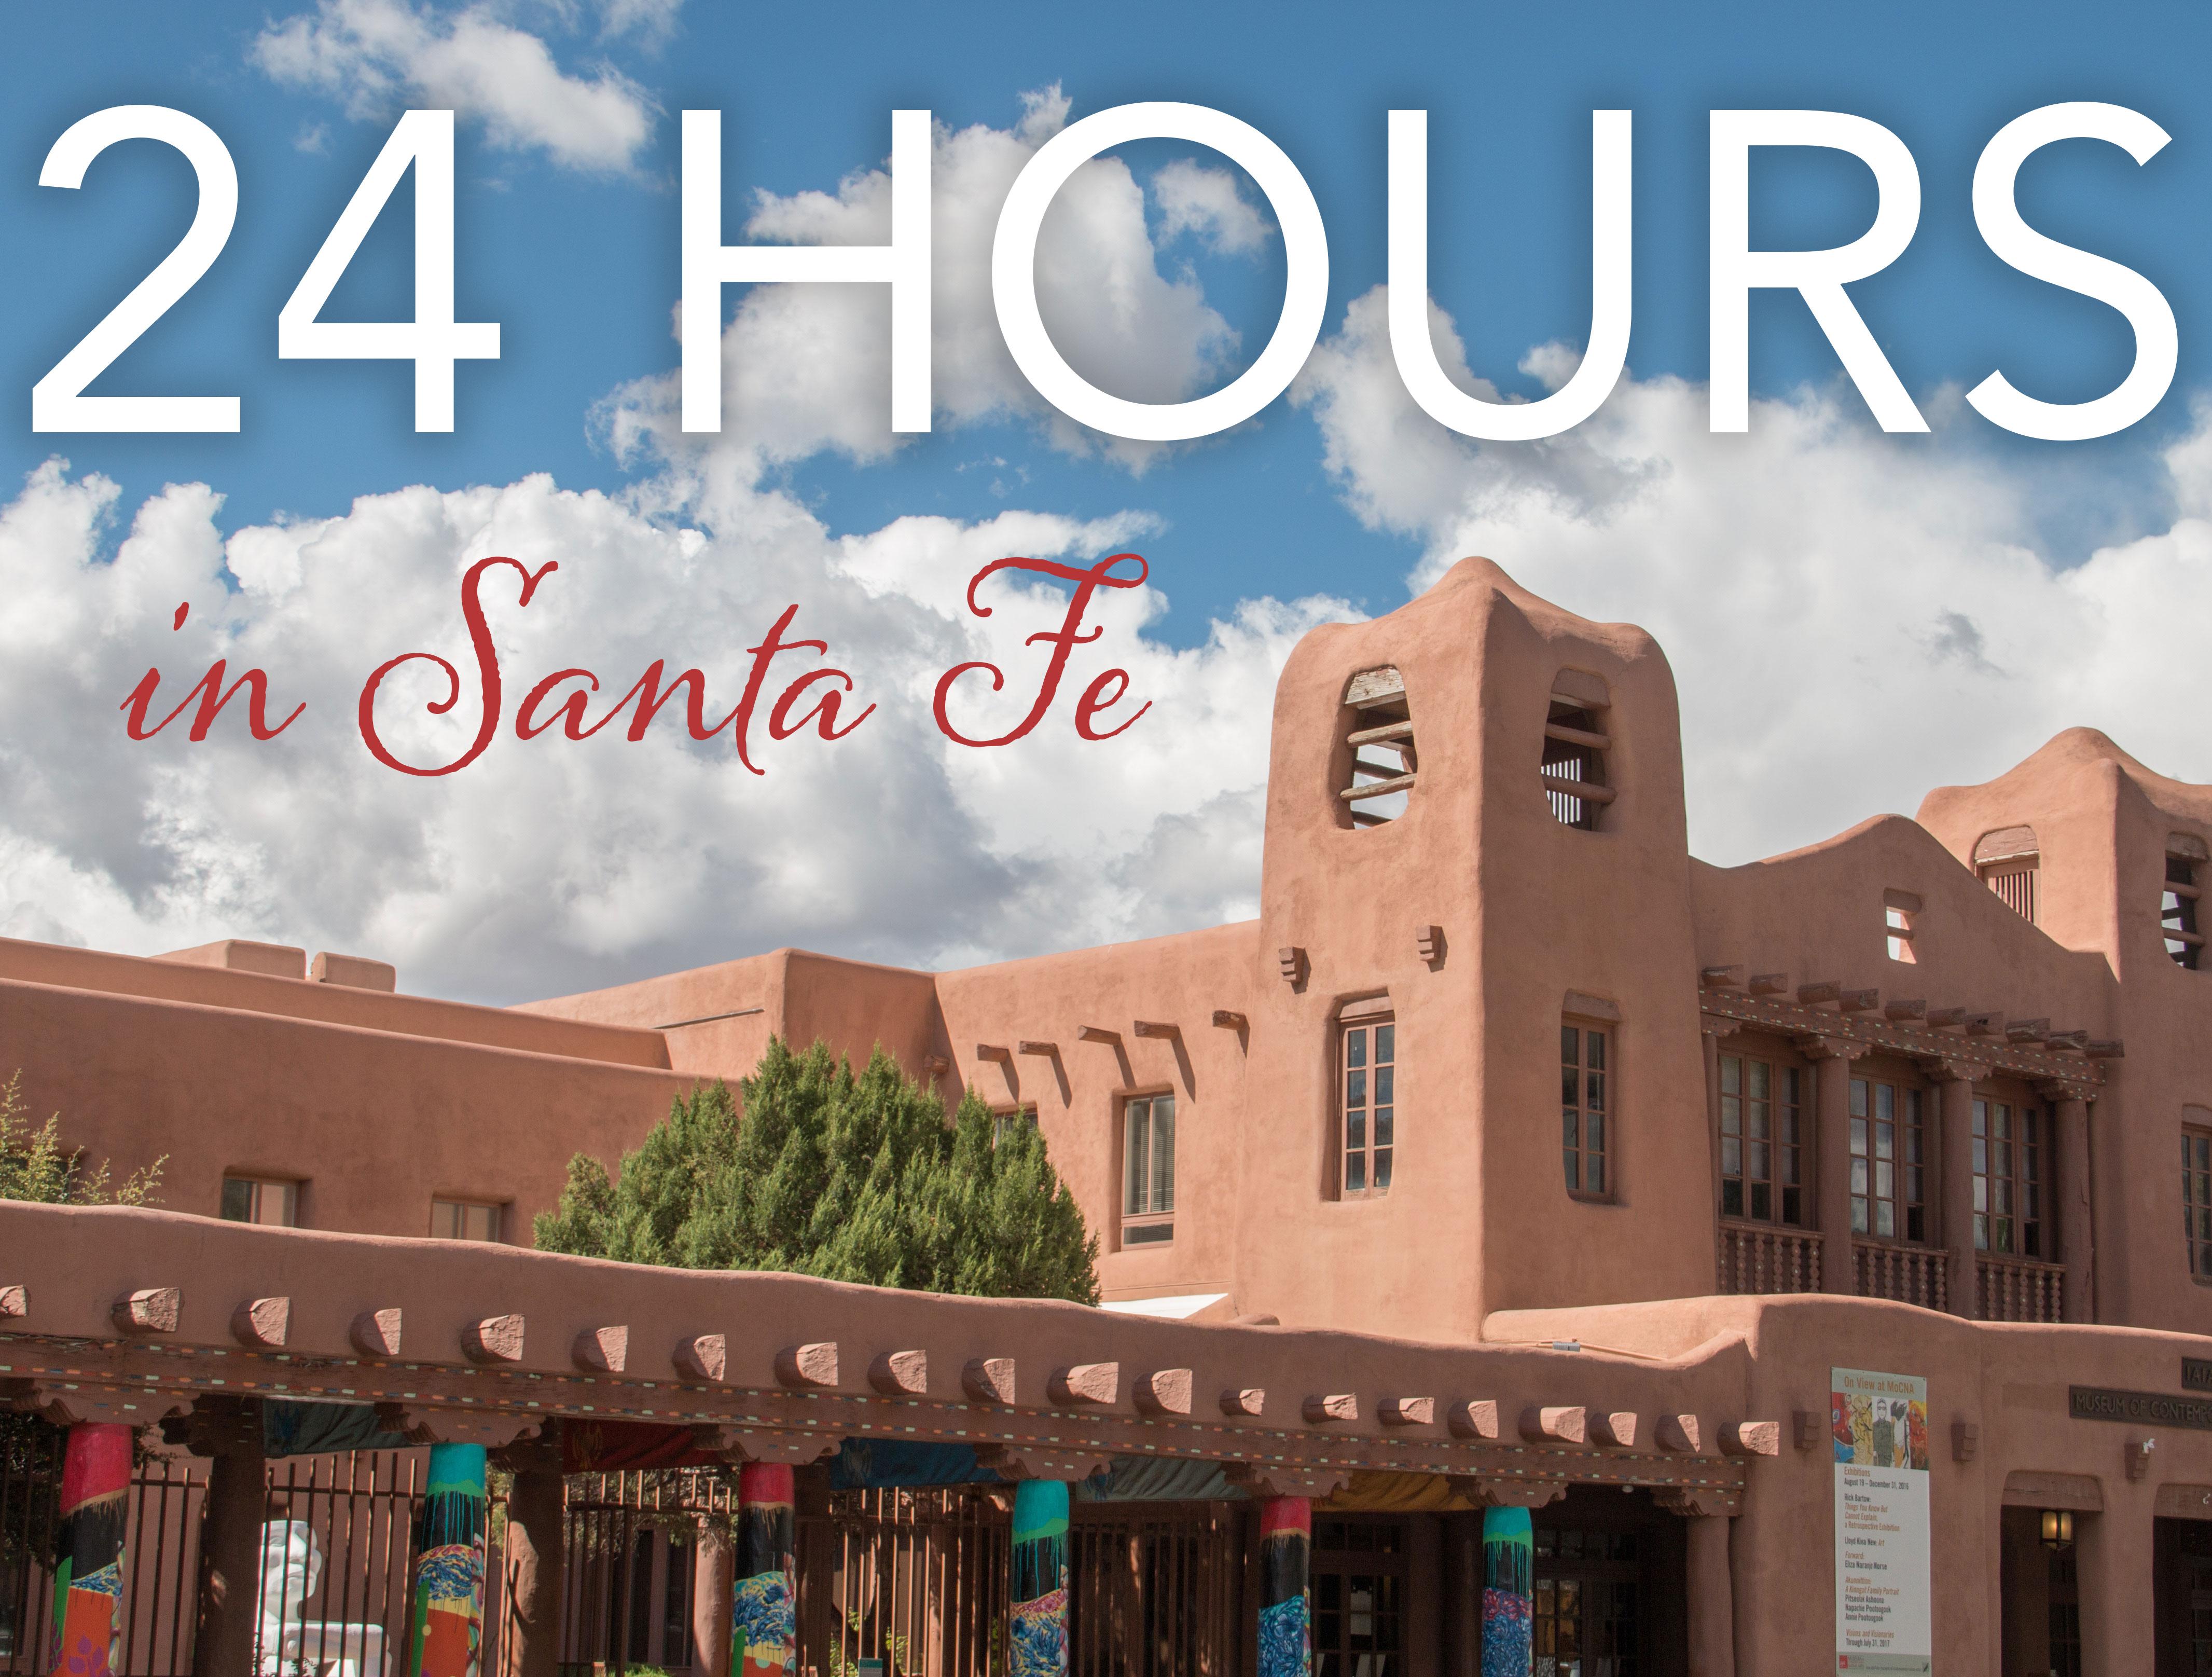 Santa Fe Facebook: 24 Hours In Santa Fe